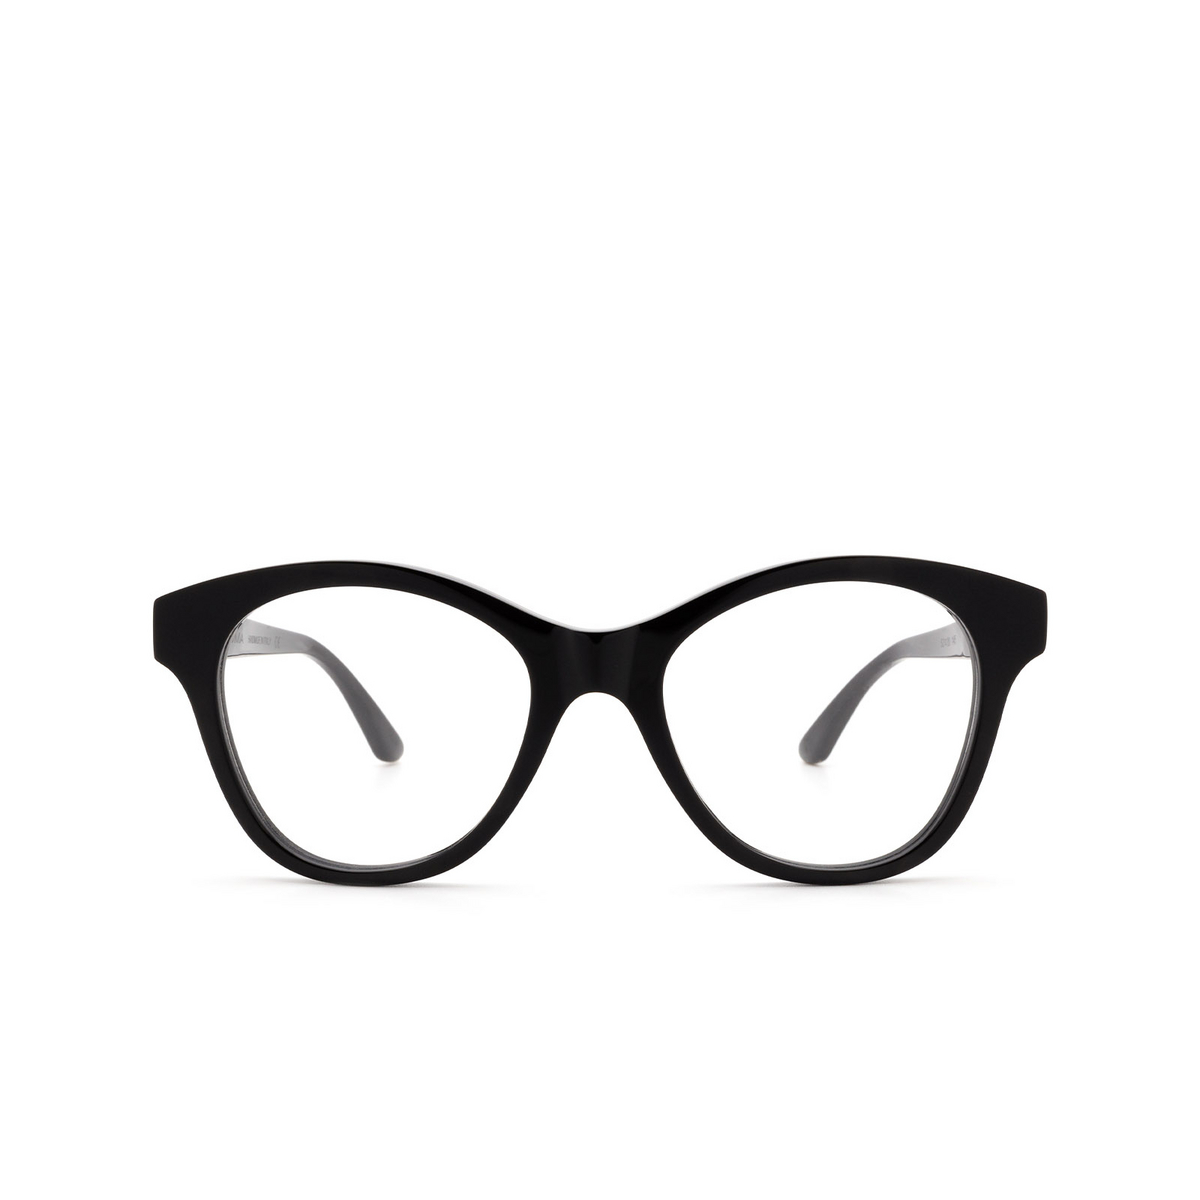 Huma® Cat-eye Eyeglasses: Mia color Black 06V - front view.